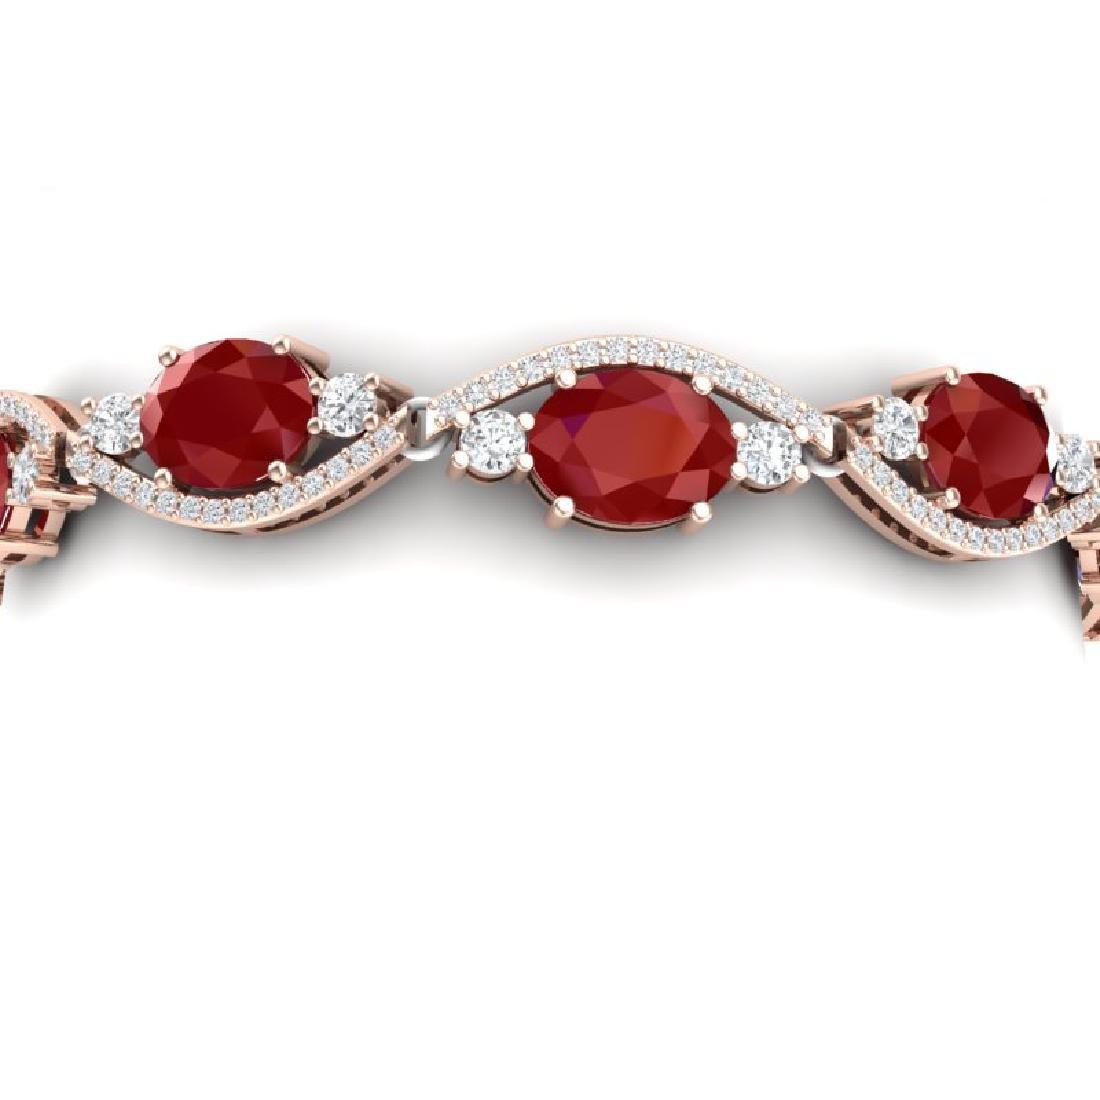 22.15 CTW Royalty Ruby & VS Diamond Bracelet 18K Rose